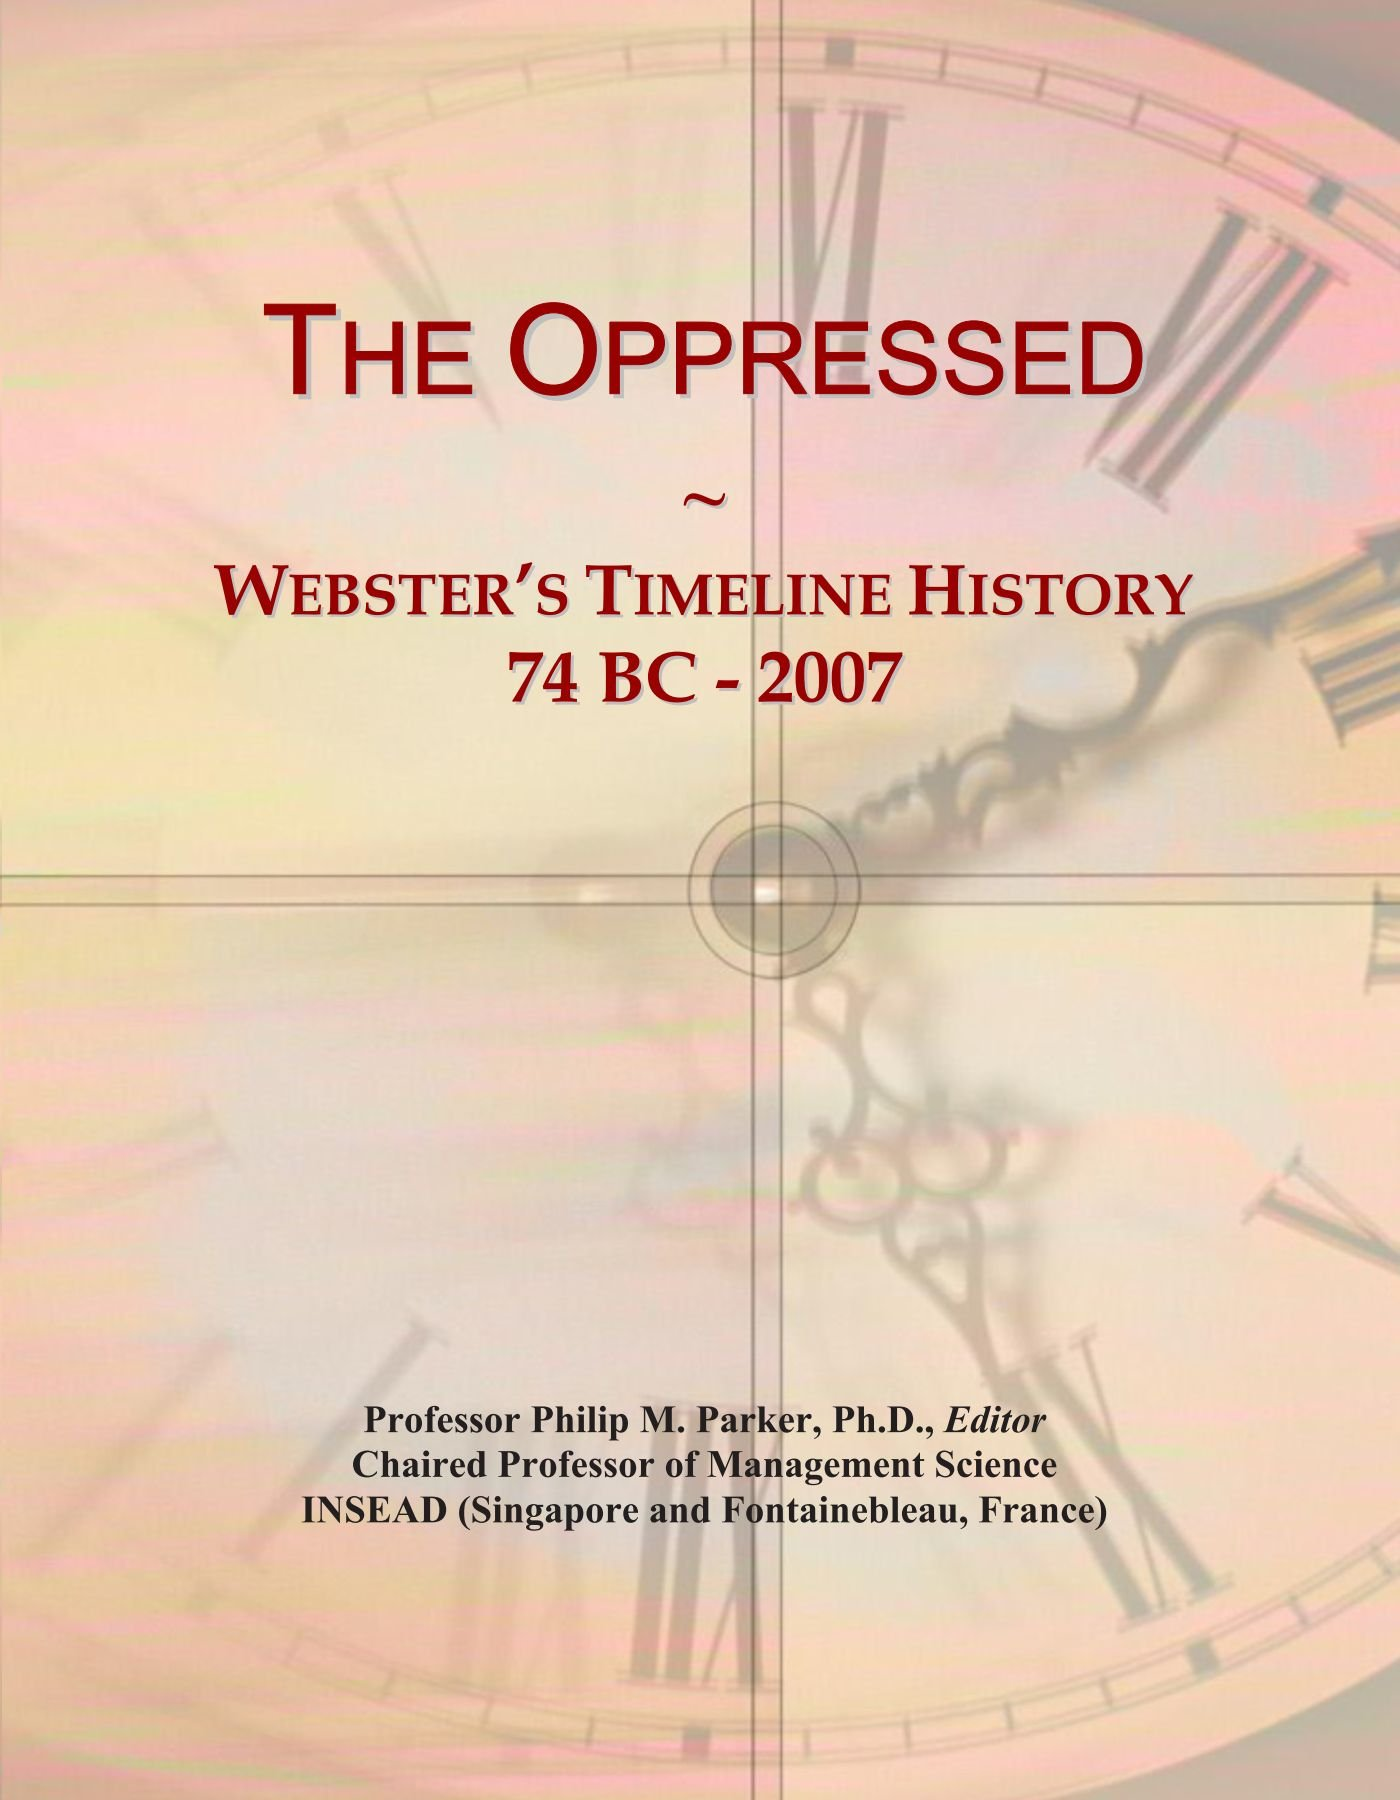 The Oppressed: Webster's Timeline History, 74 BC - 2007 PDF